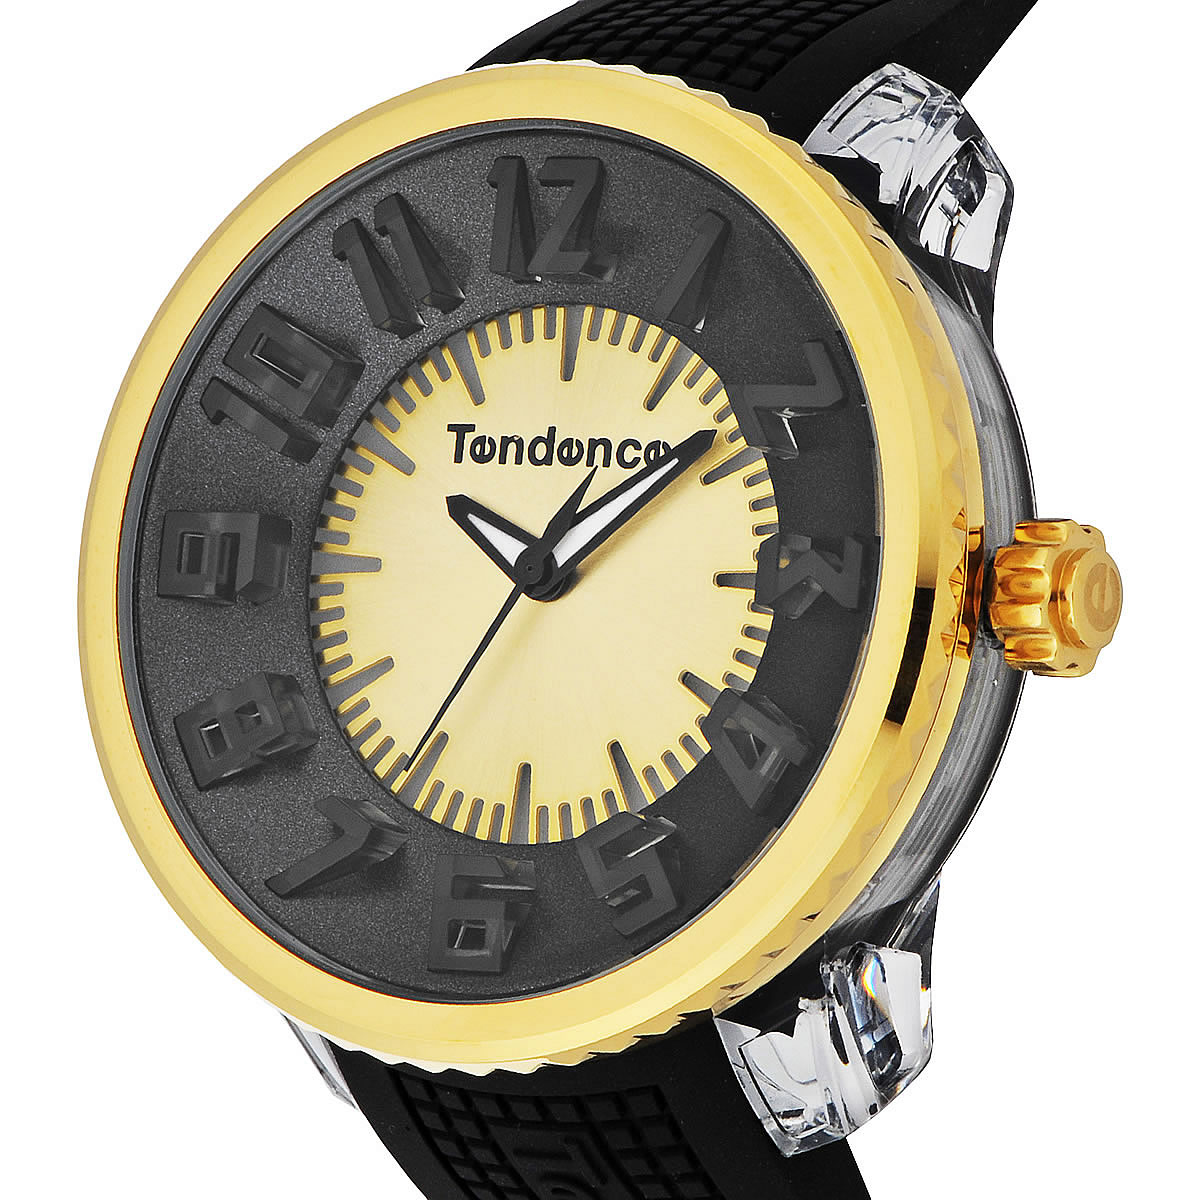 Tendence テンデンス FLASH